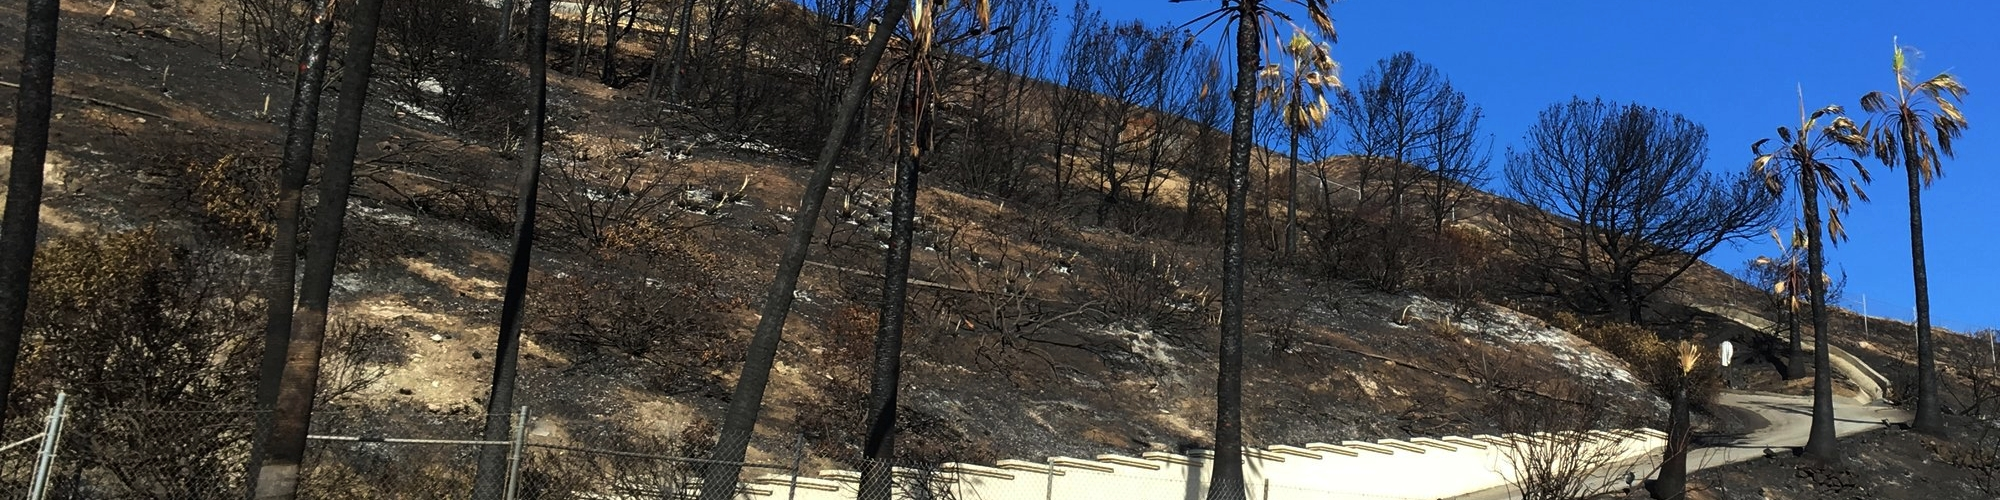 California wildfire (1).JPG